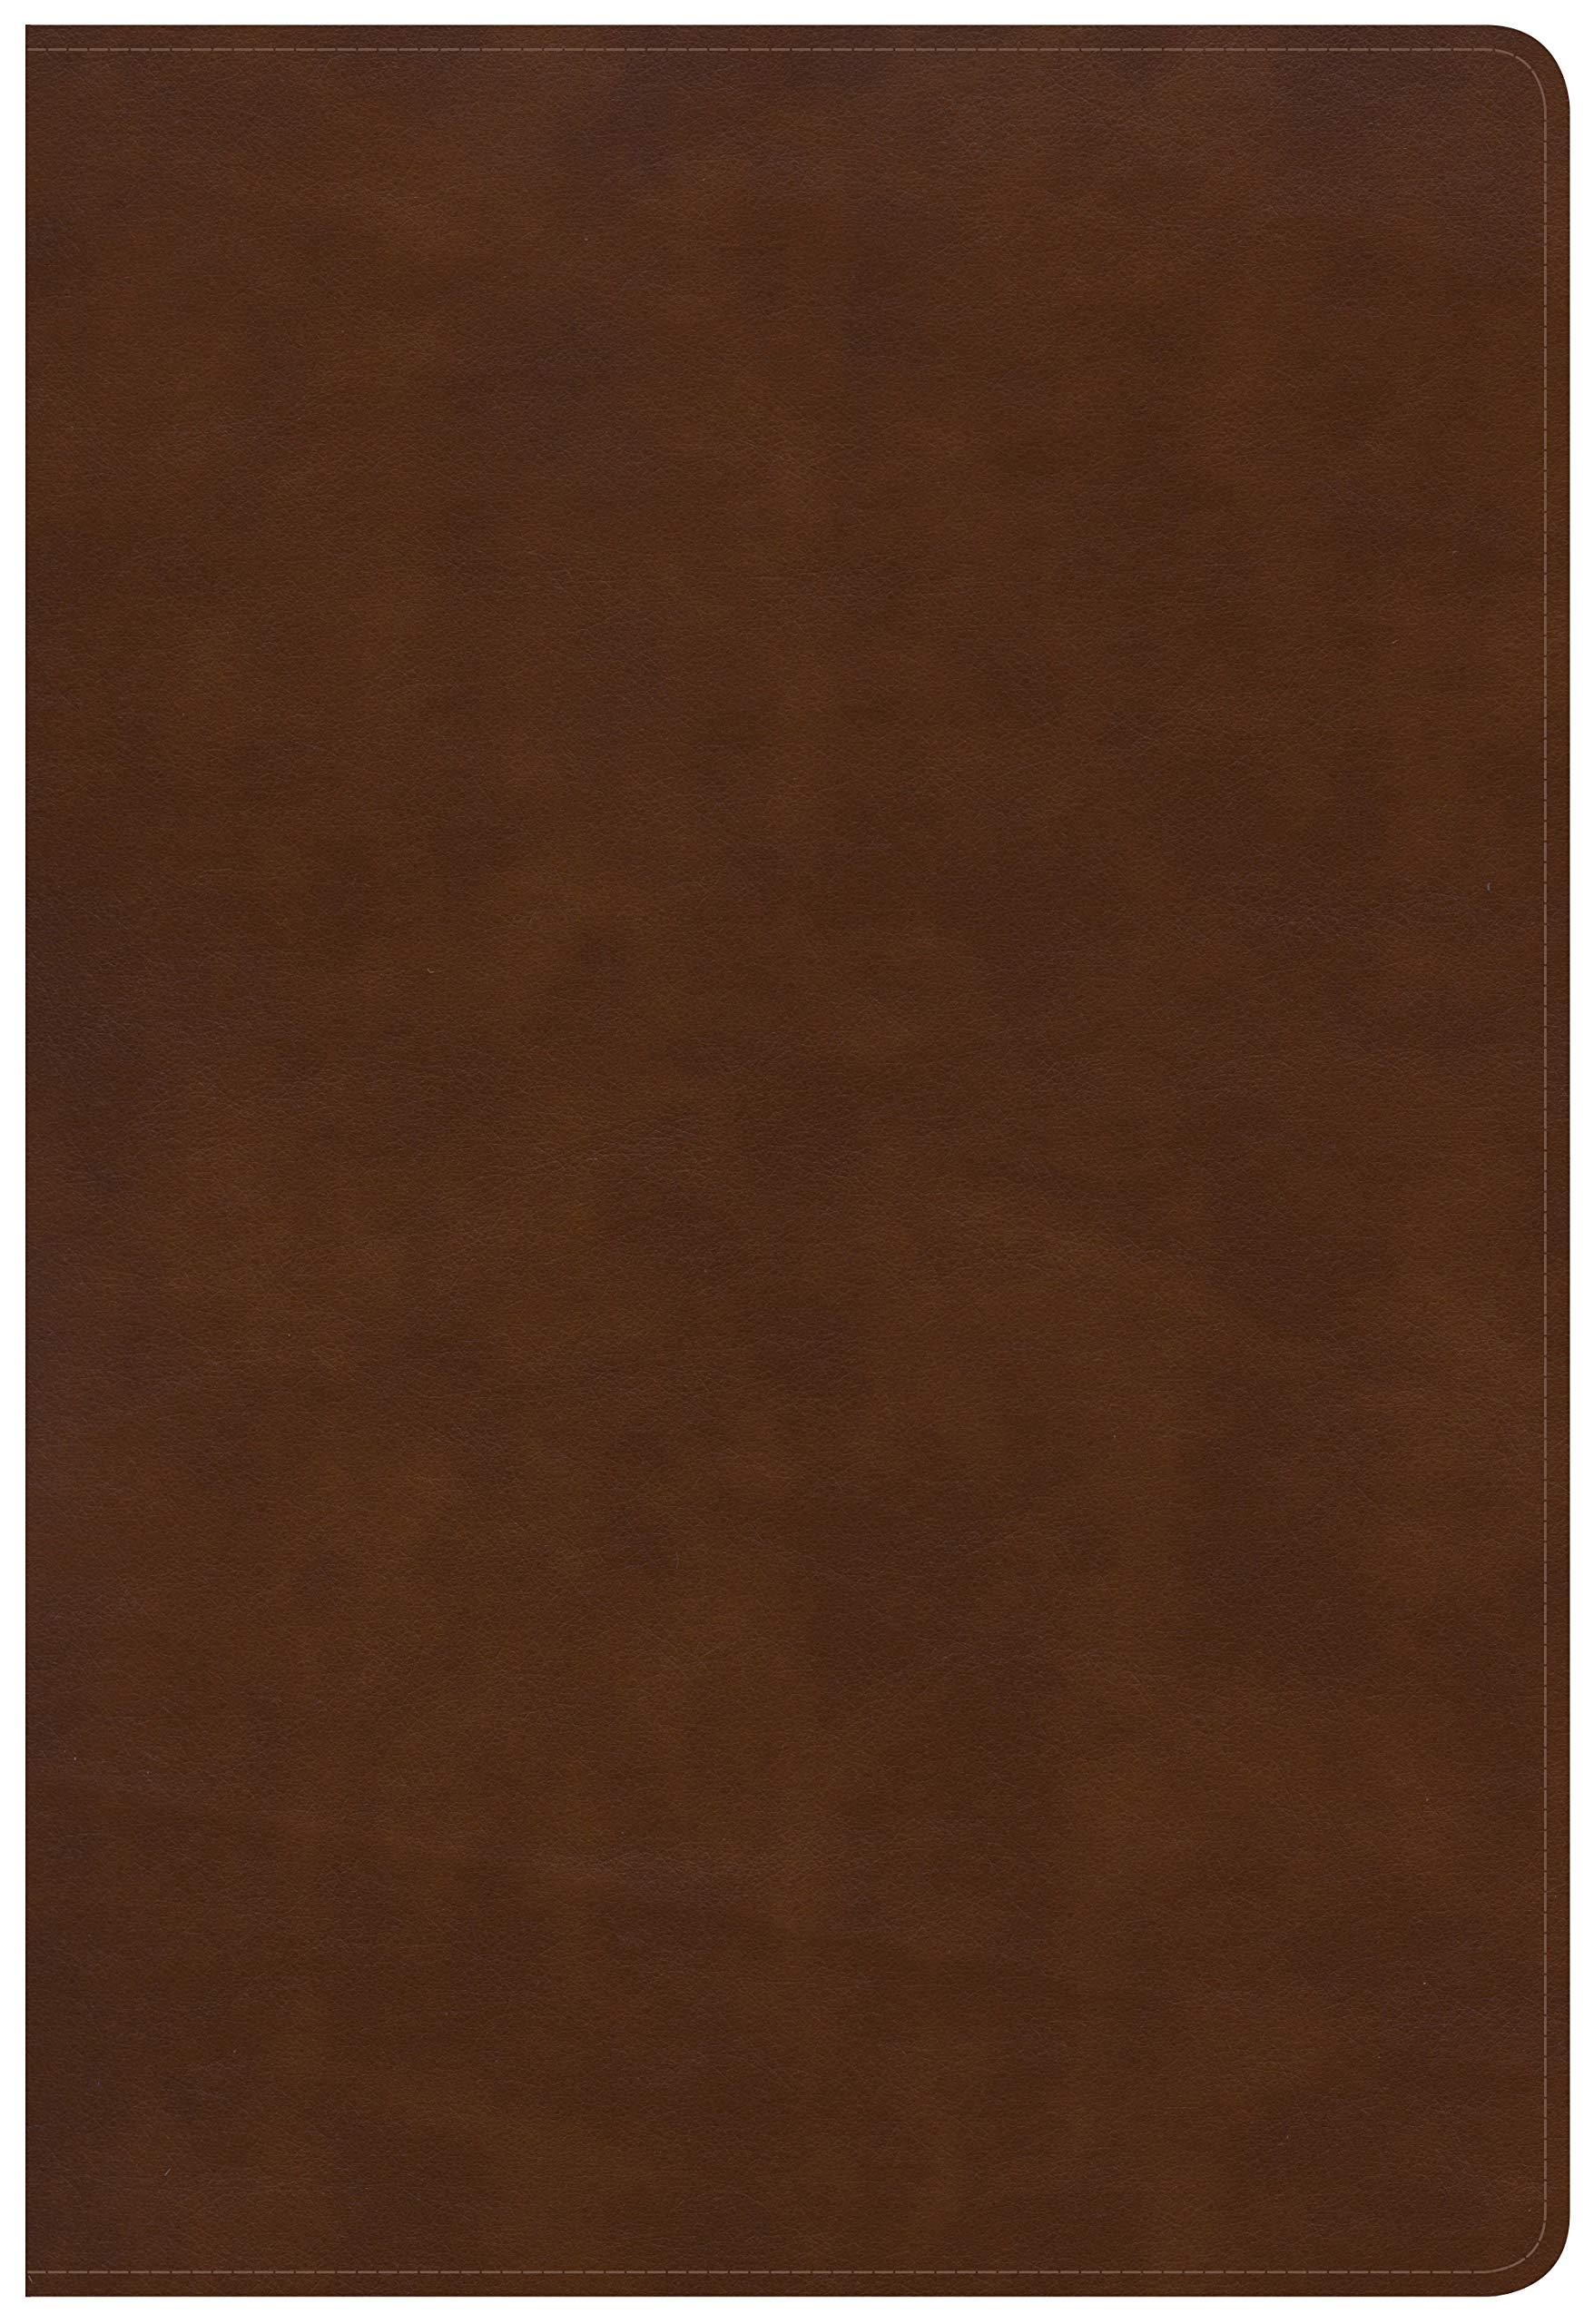 KJV Large Print Ultrathin Reference Bible, British Tan LeatherTouch, Black Letter Edition ebook